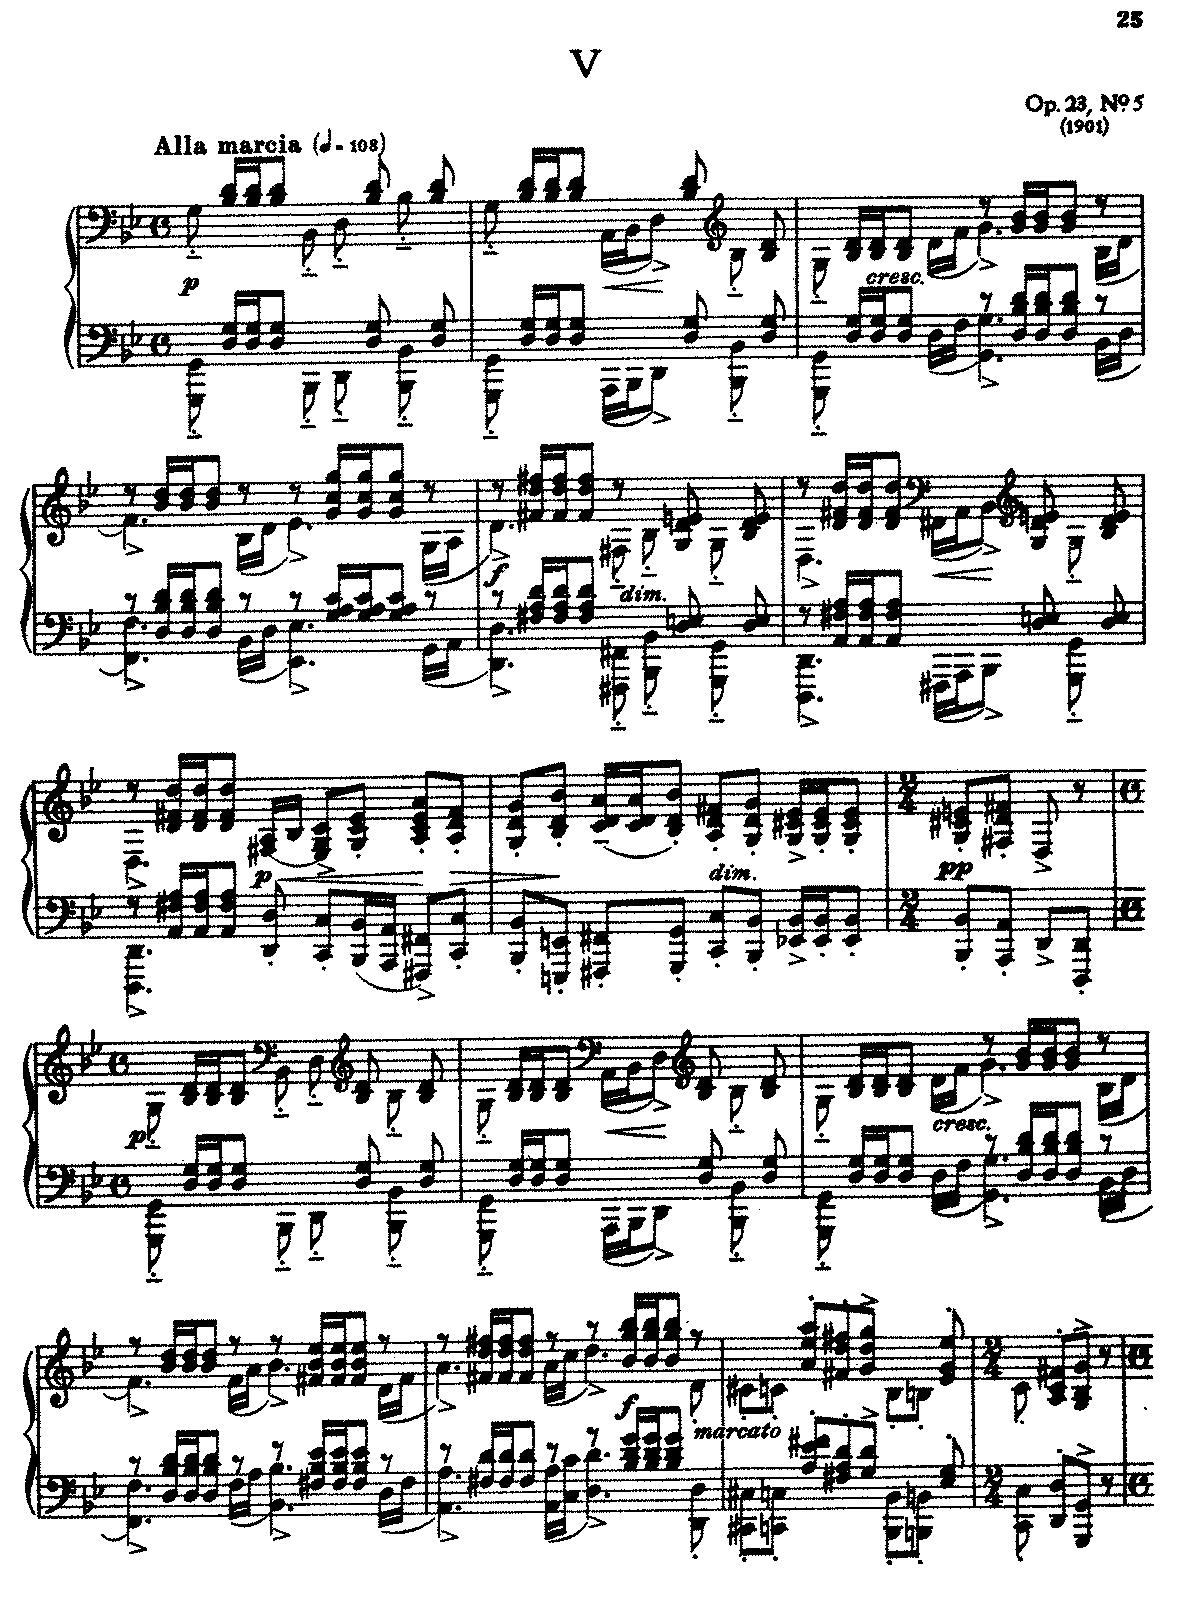 Audio Sample